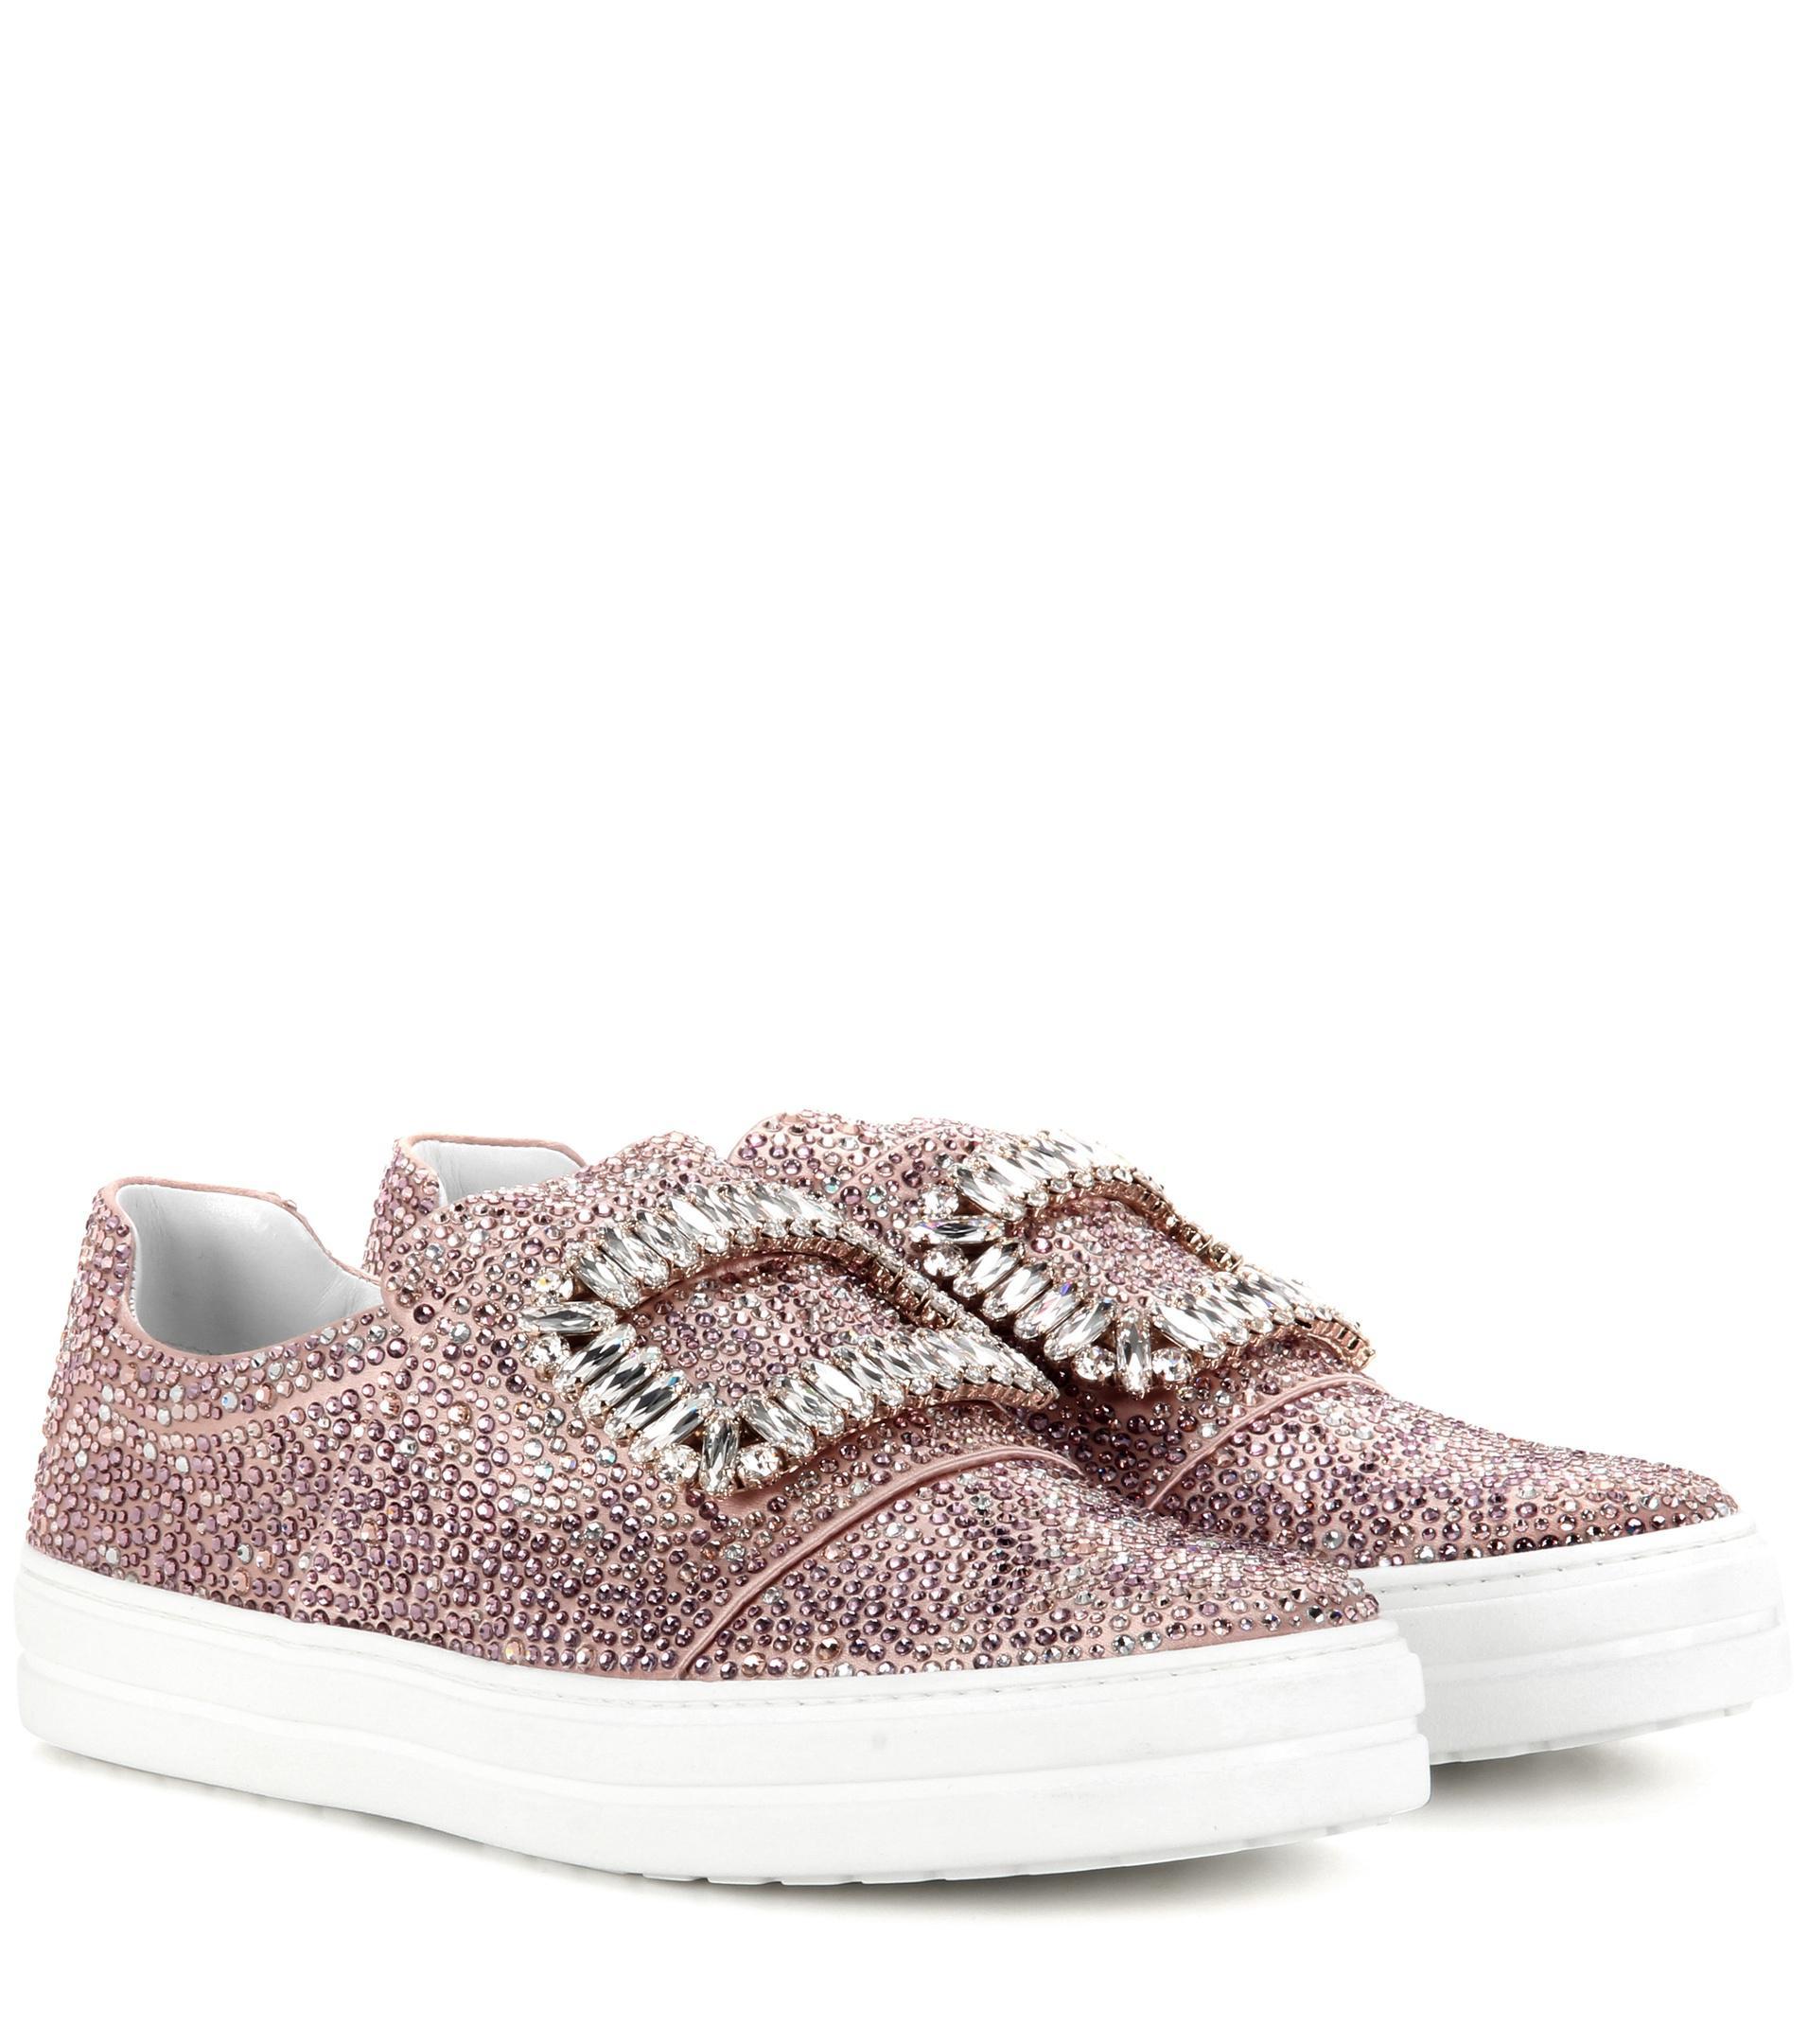 Roger Vivier Sneaky Viv' slip-on sneakers